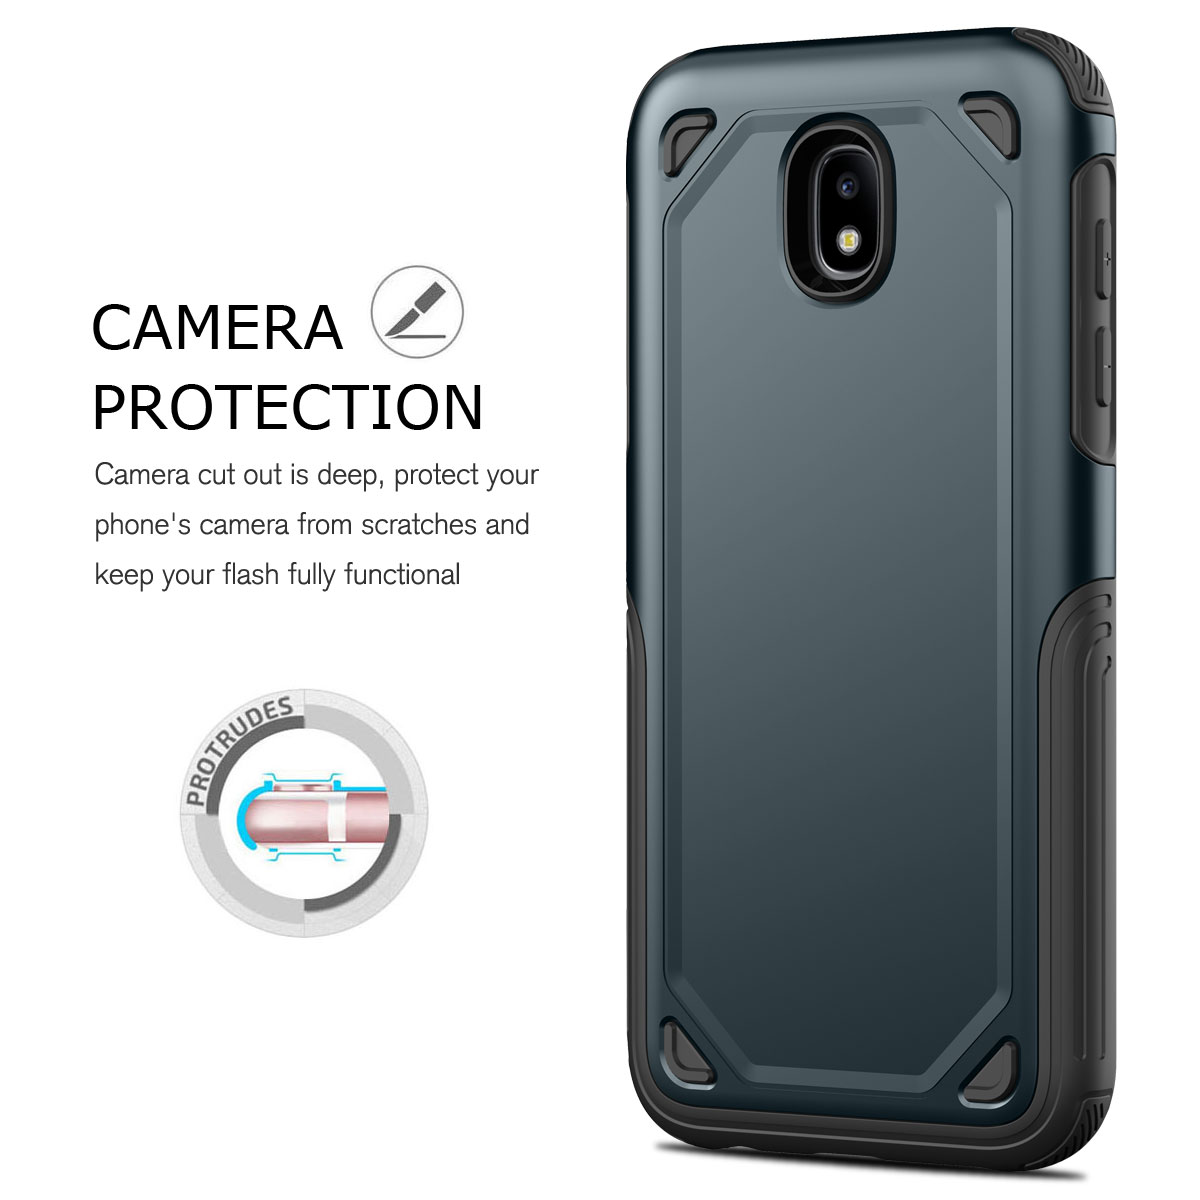 For Samsung Galaxy J3 J5 J7 Pro 2017 Slim Hybrid Shockproof Rubber Tough Case